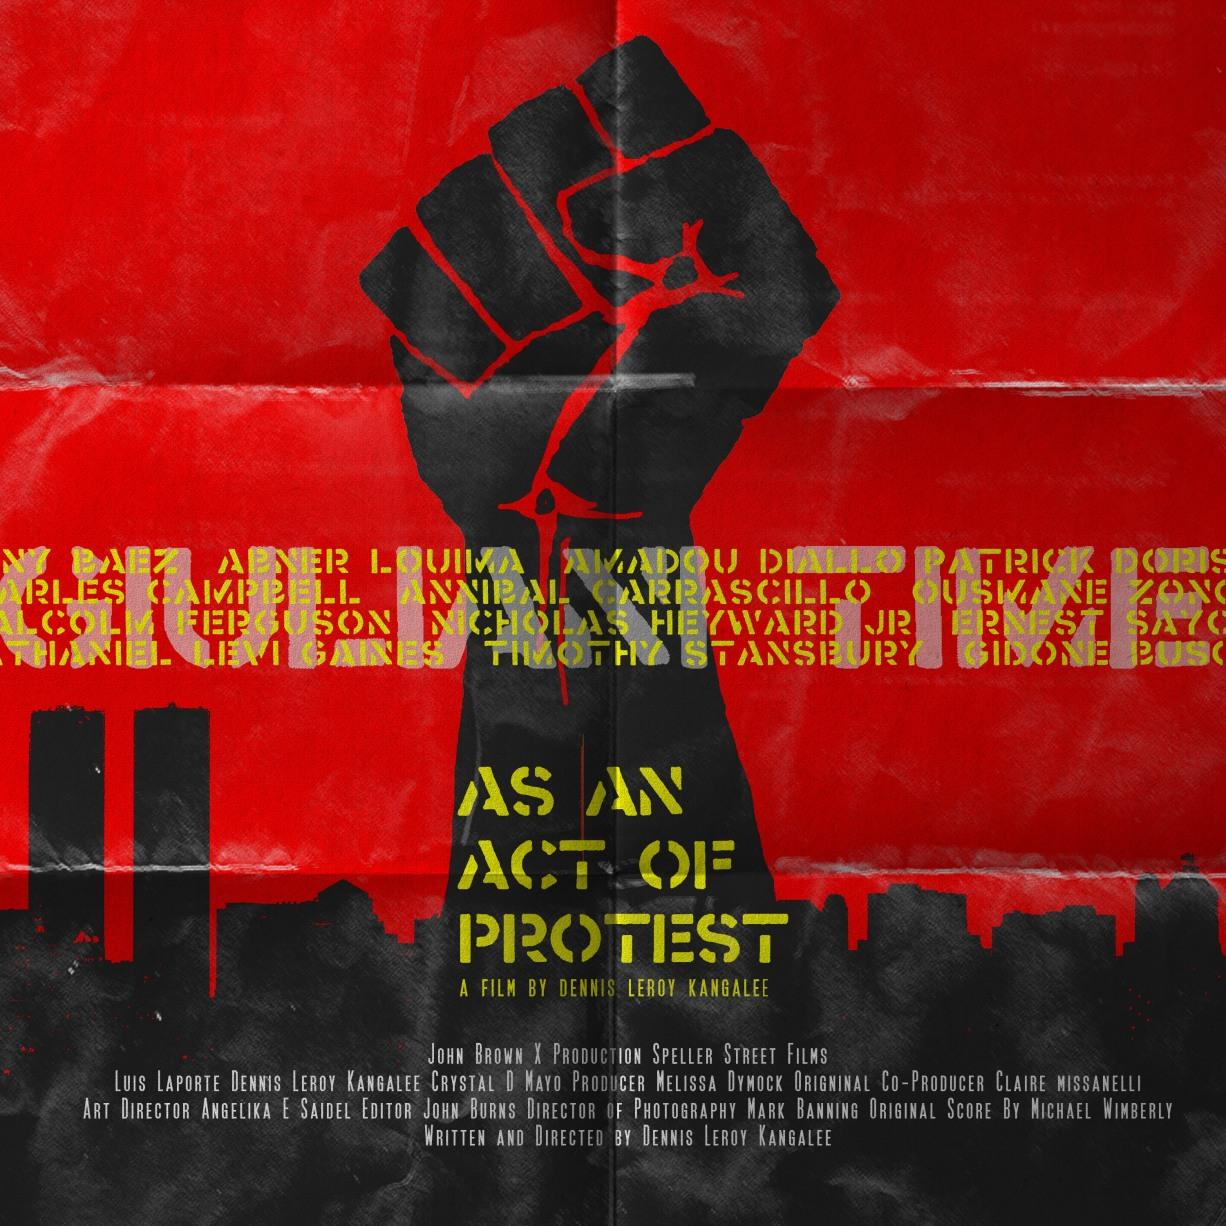 ProtestVagabond1.jpg